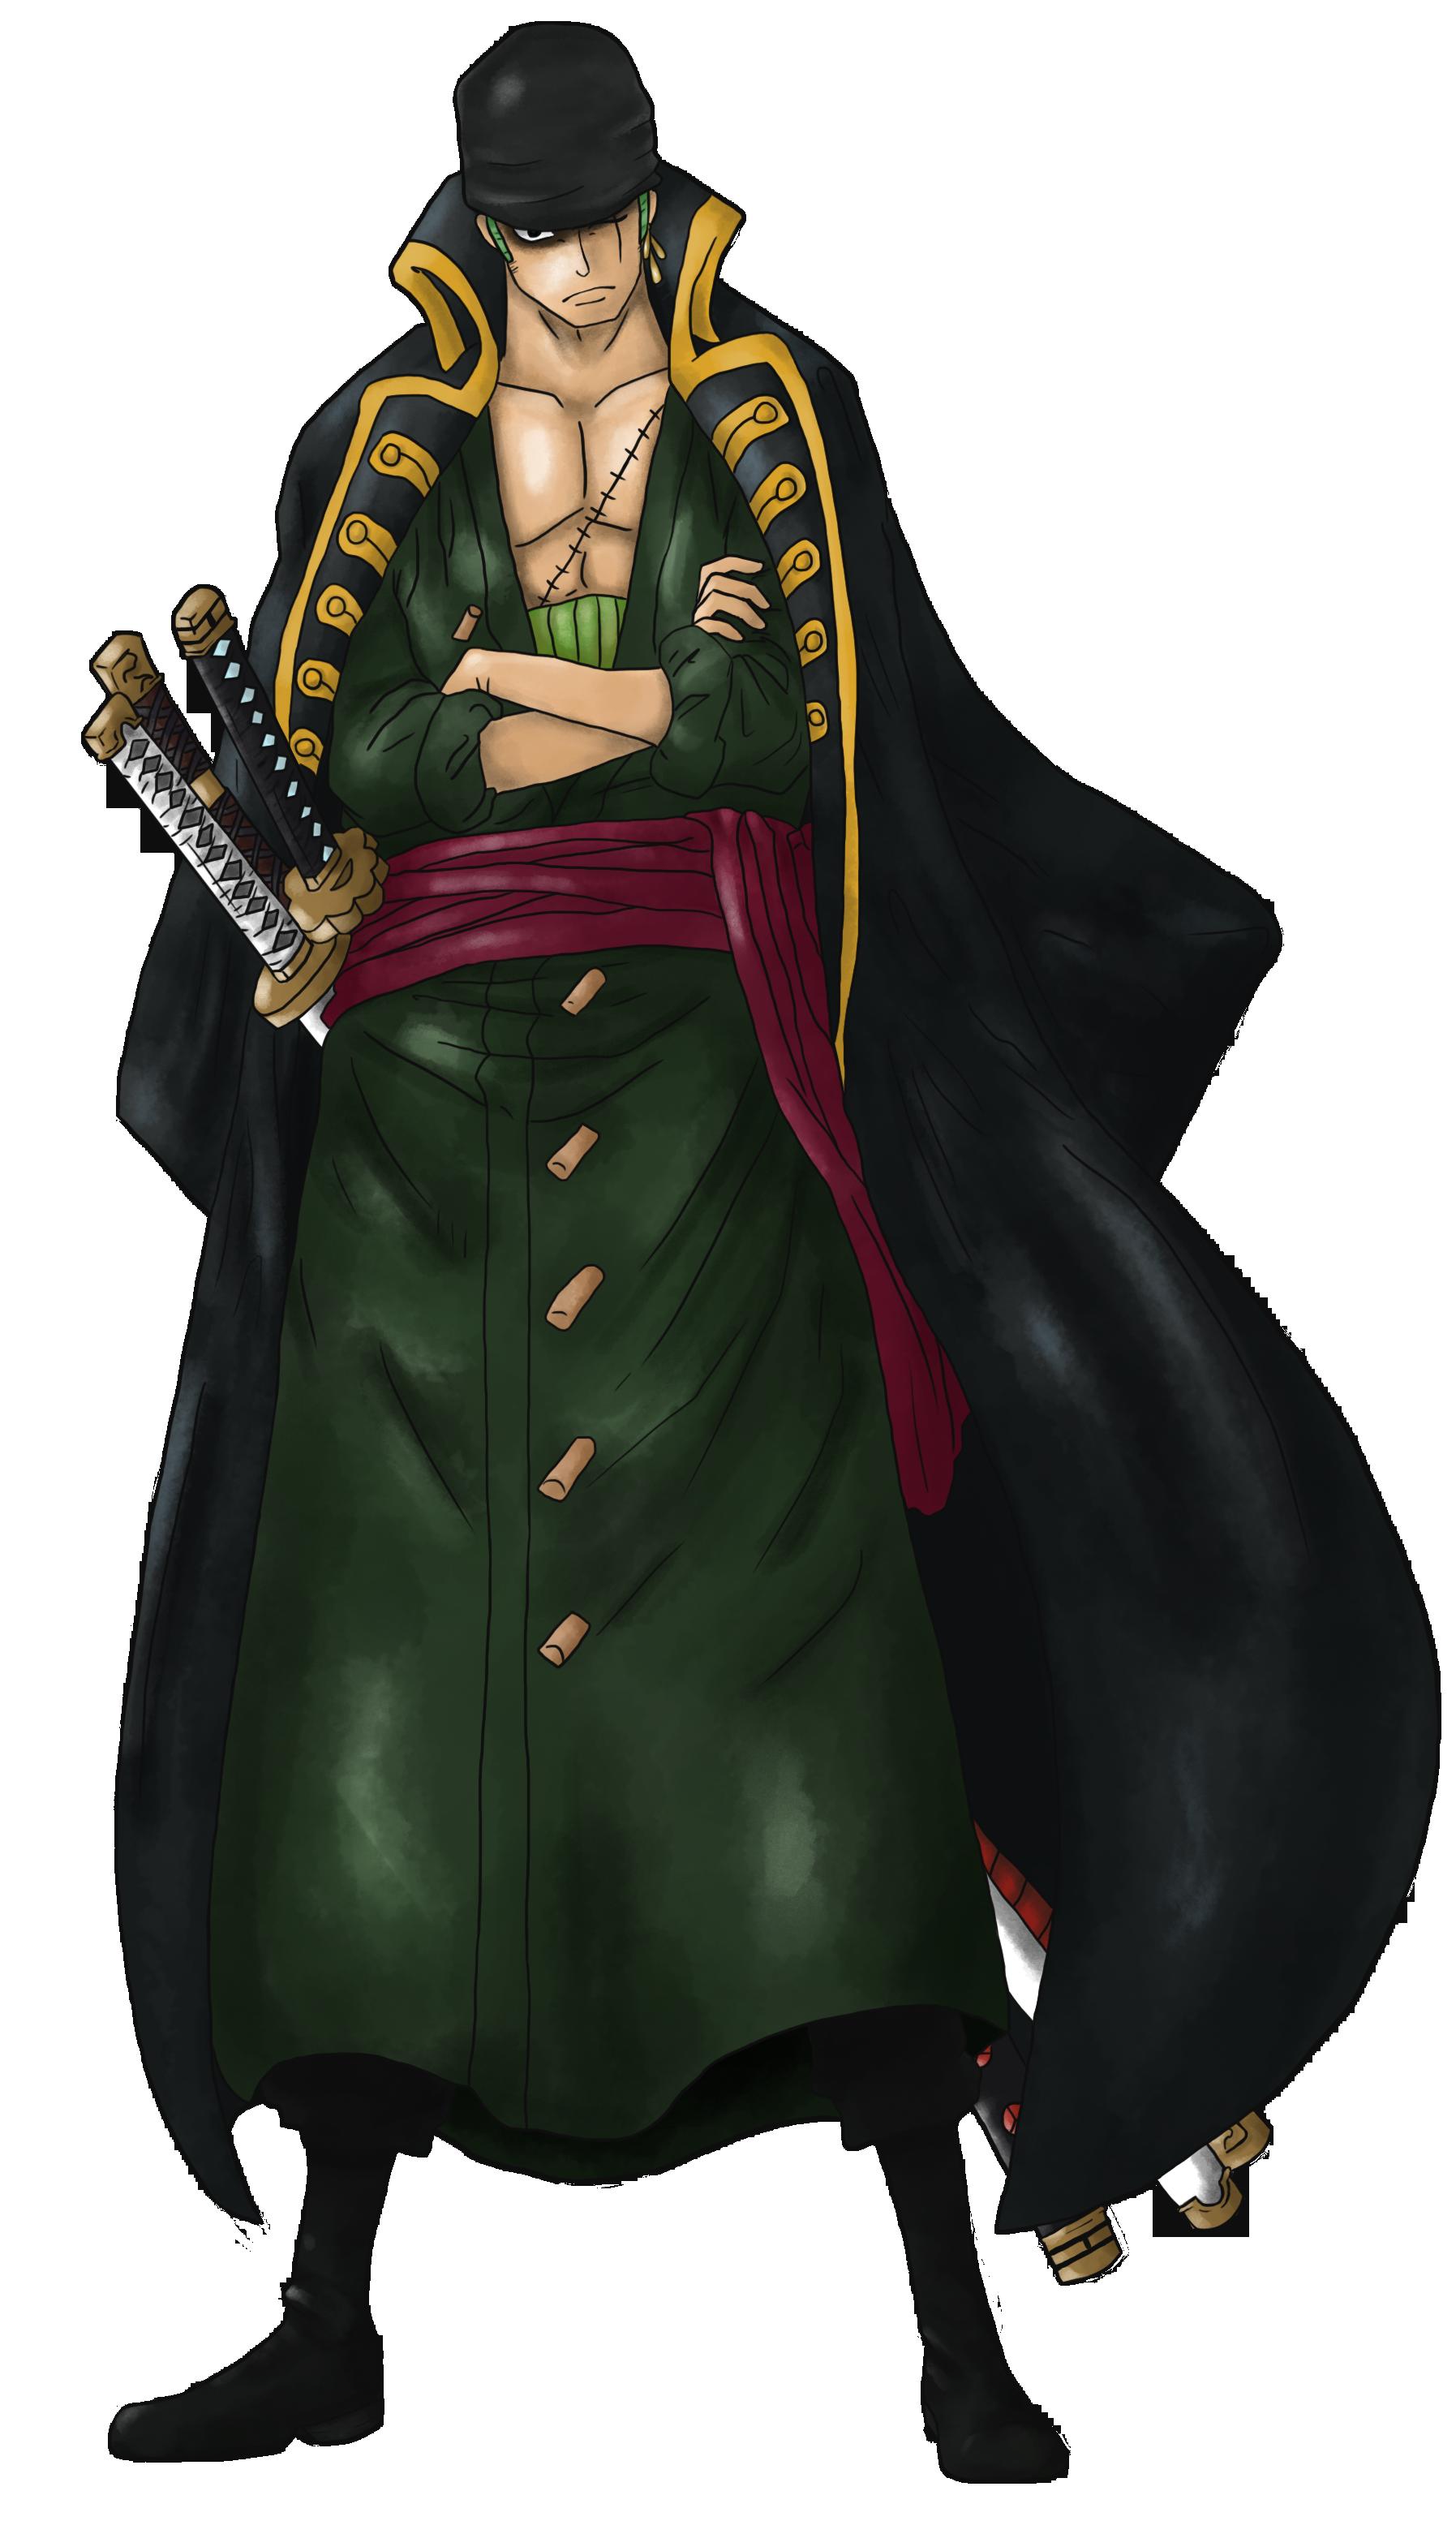 Roronoa Zoro | Fictional Characters Wiki | FANDOM powered ...